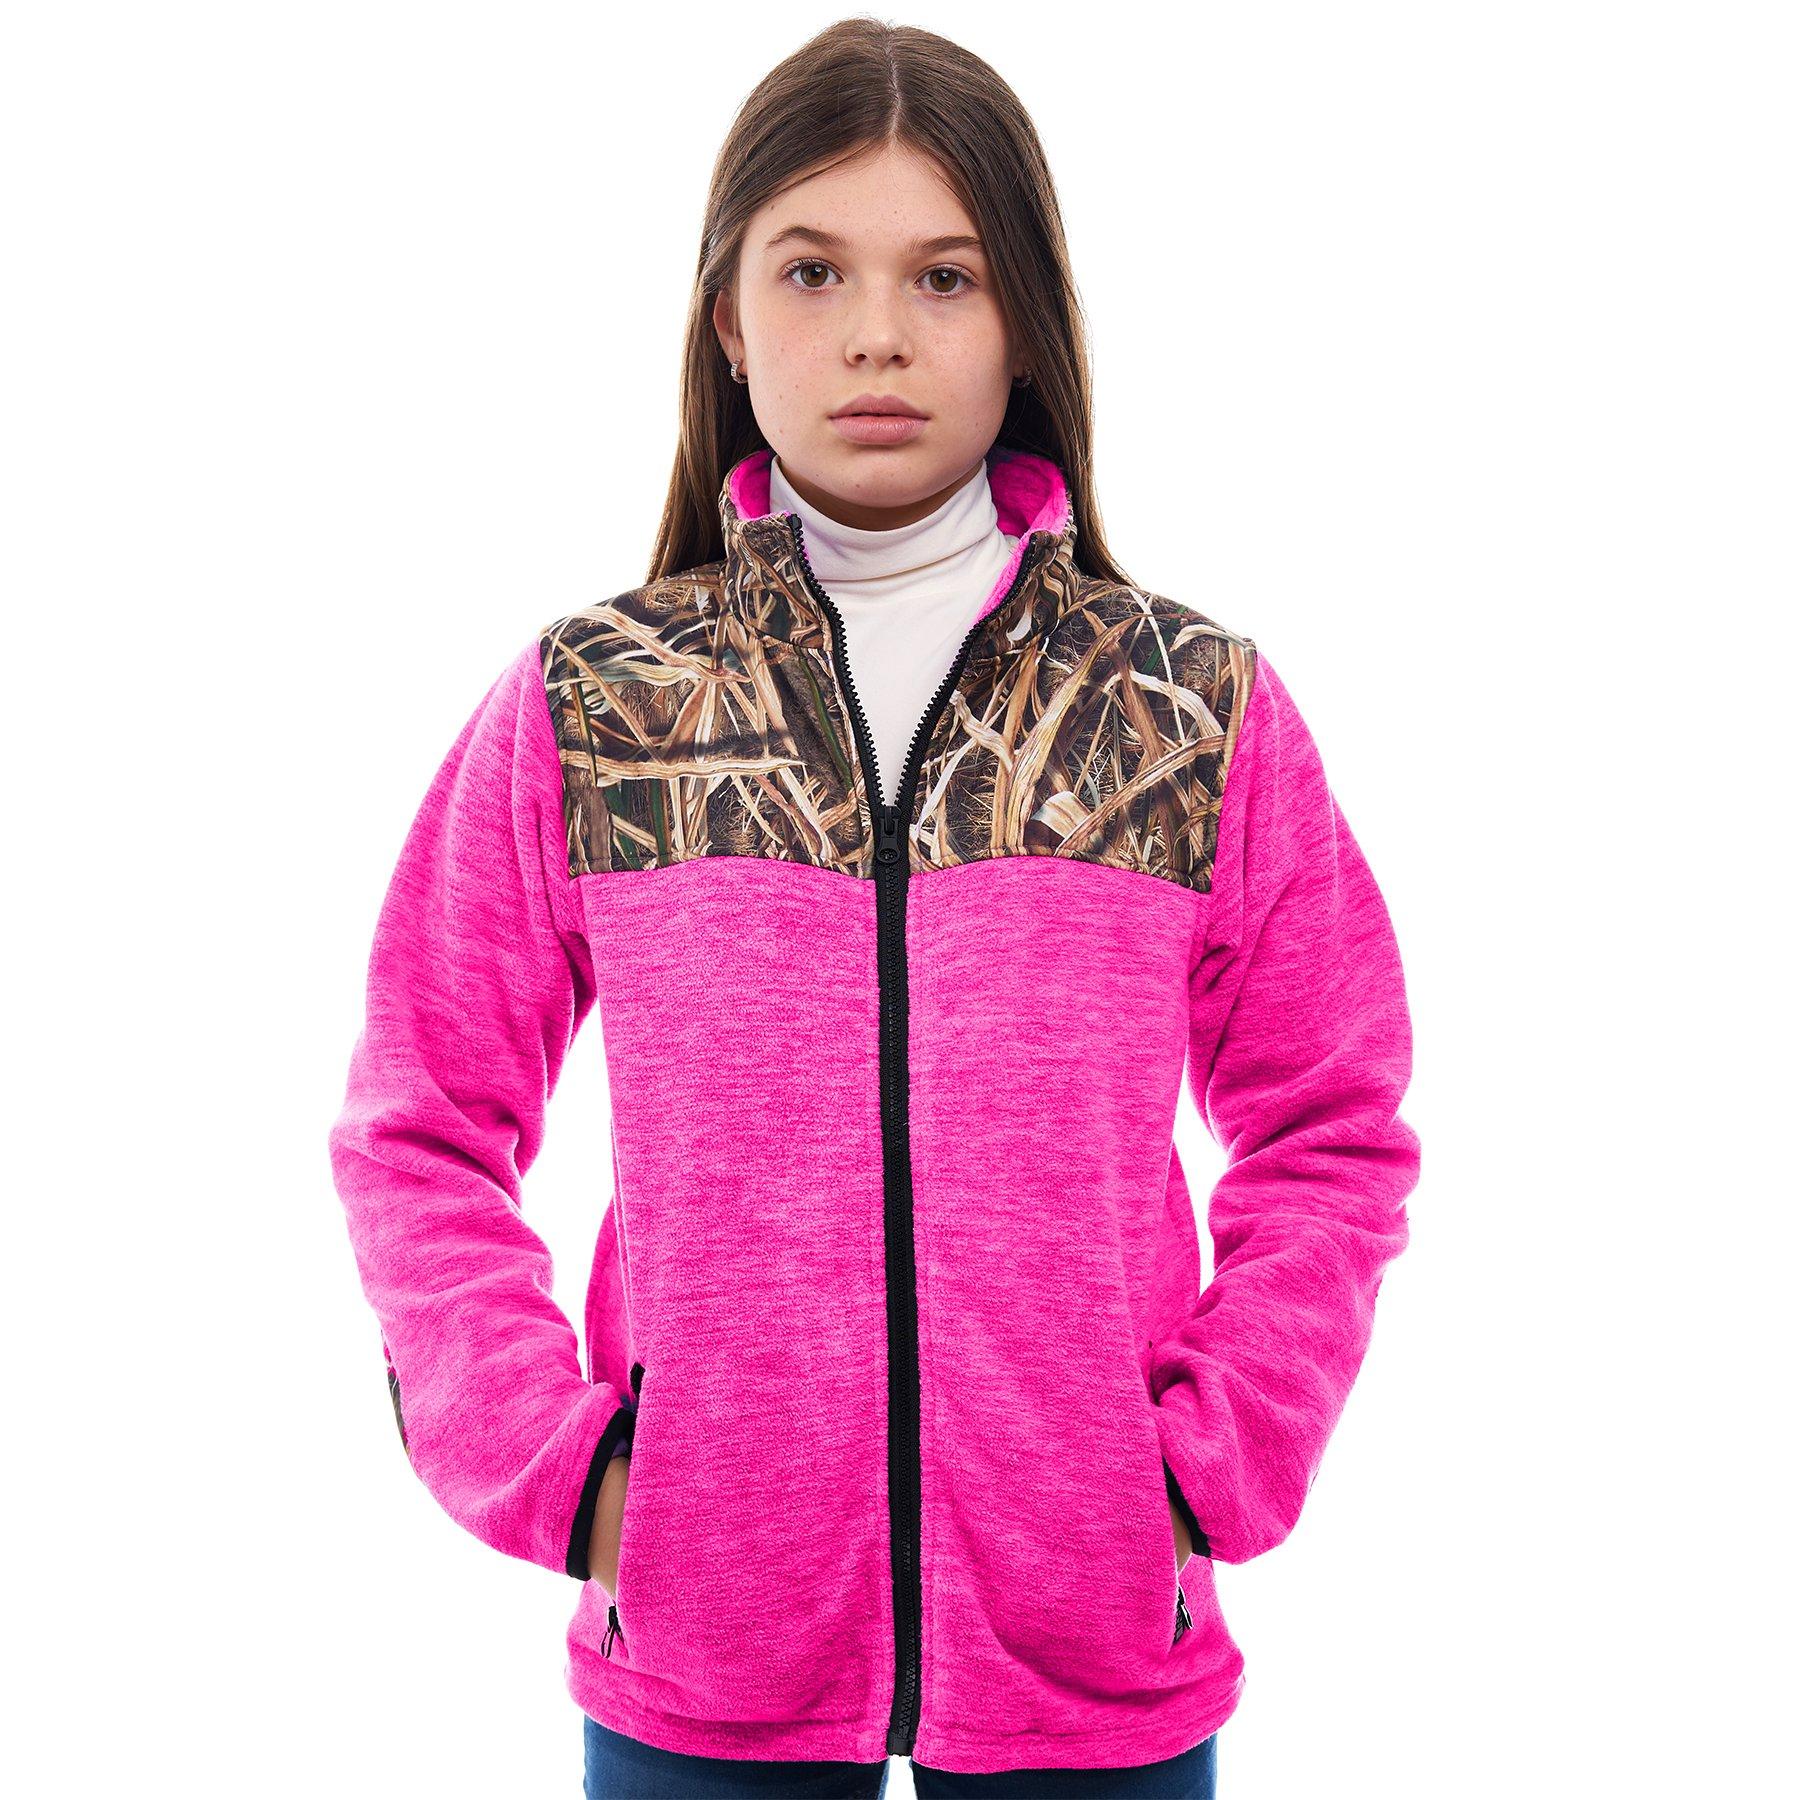 TrailCrest Children's C-Max Full Zip Fleece Jacket, Mossy Oak Shadow Grass Blades Camo